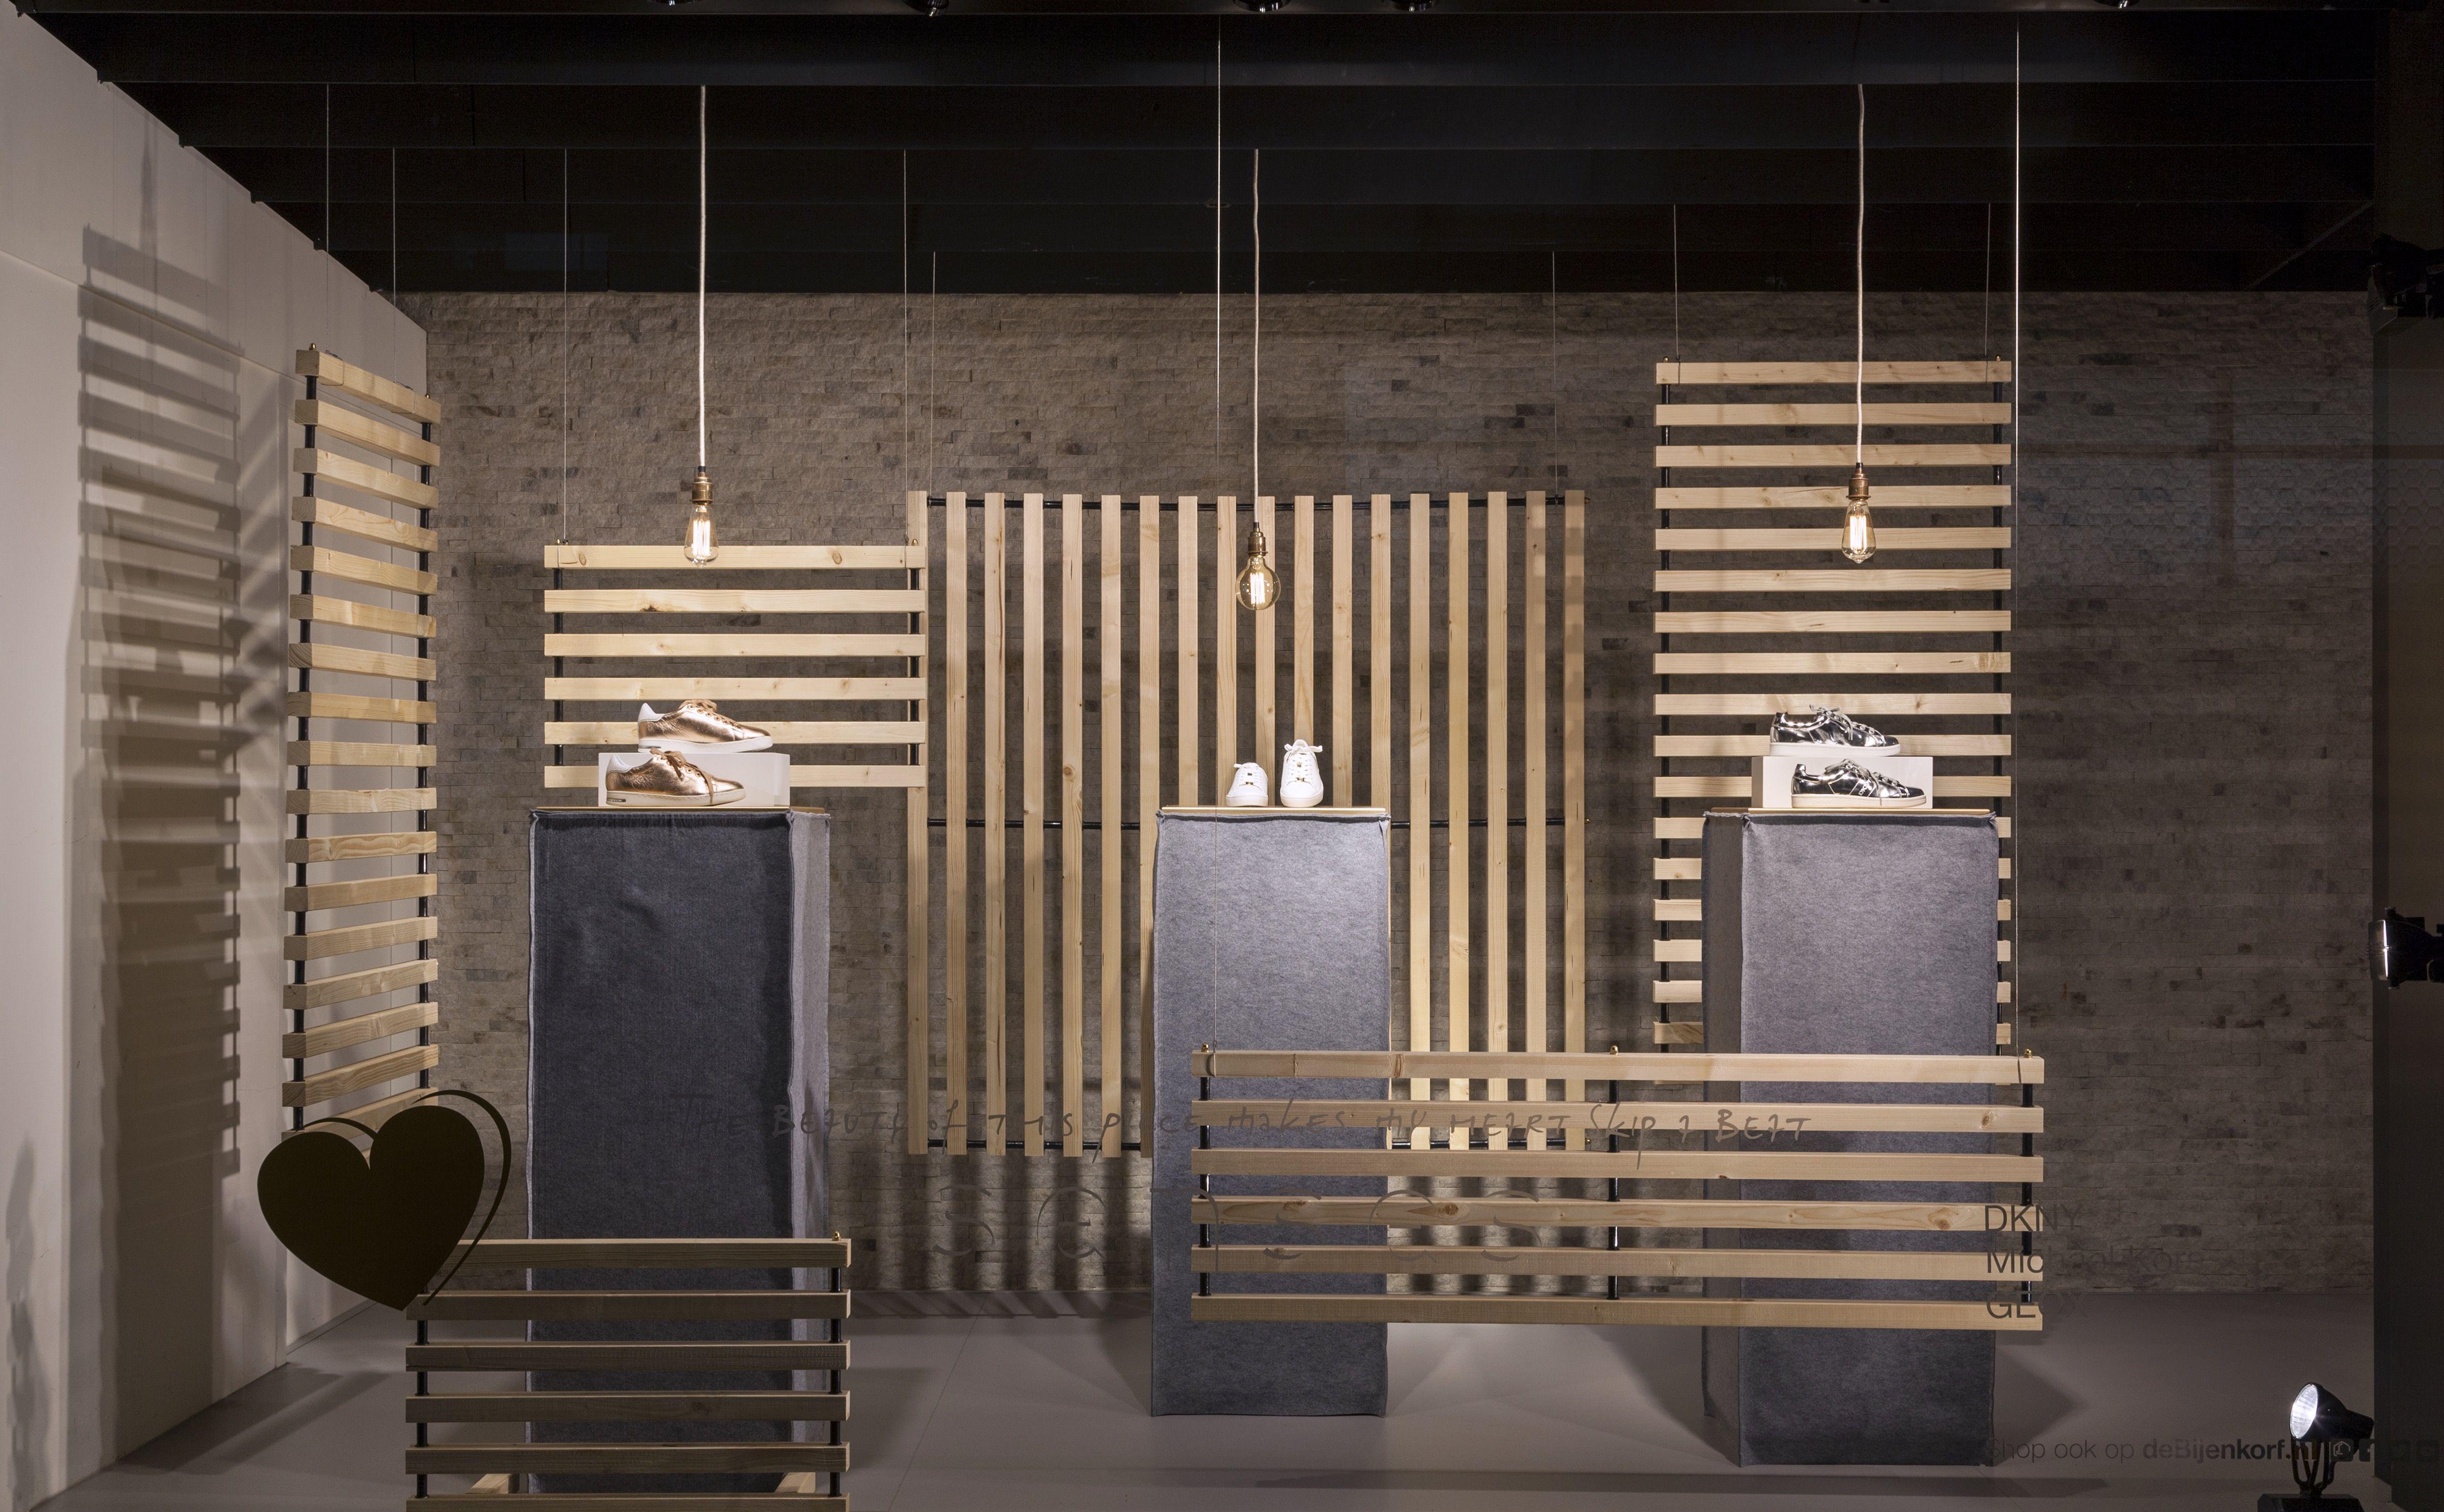 Window display ideas for jewelry  de bijenkorf  senses see  bag display  pinterest  display